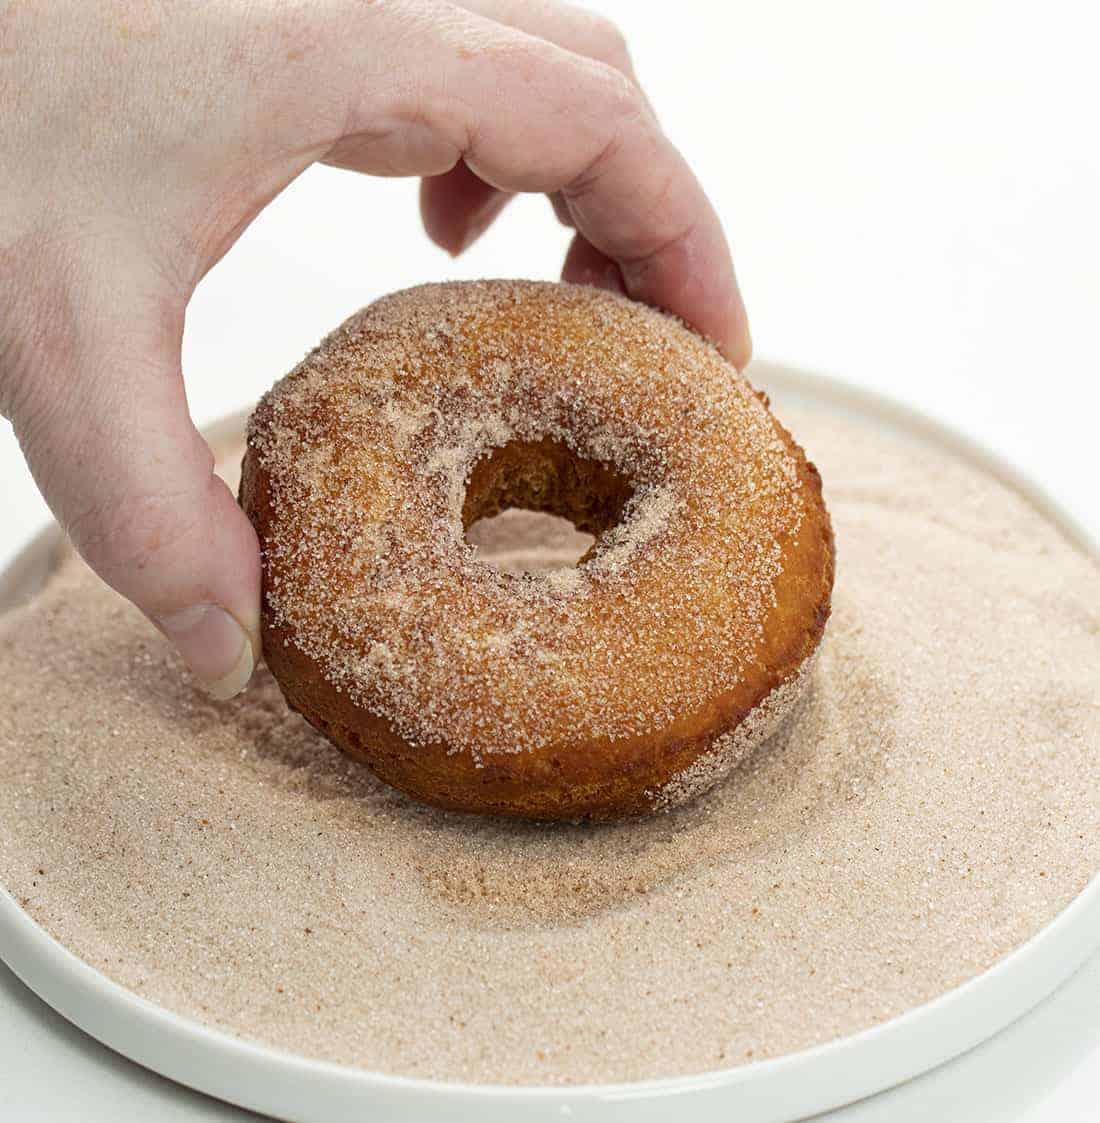 Dipping Fried Apple Cider Donut in Cinnamon Sugar